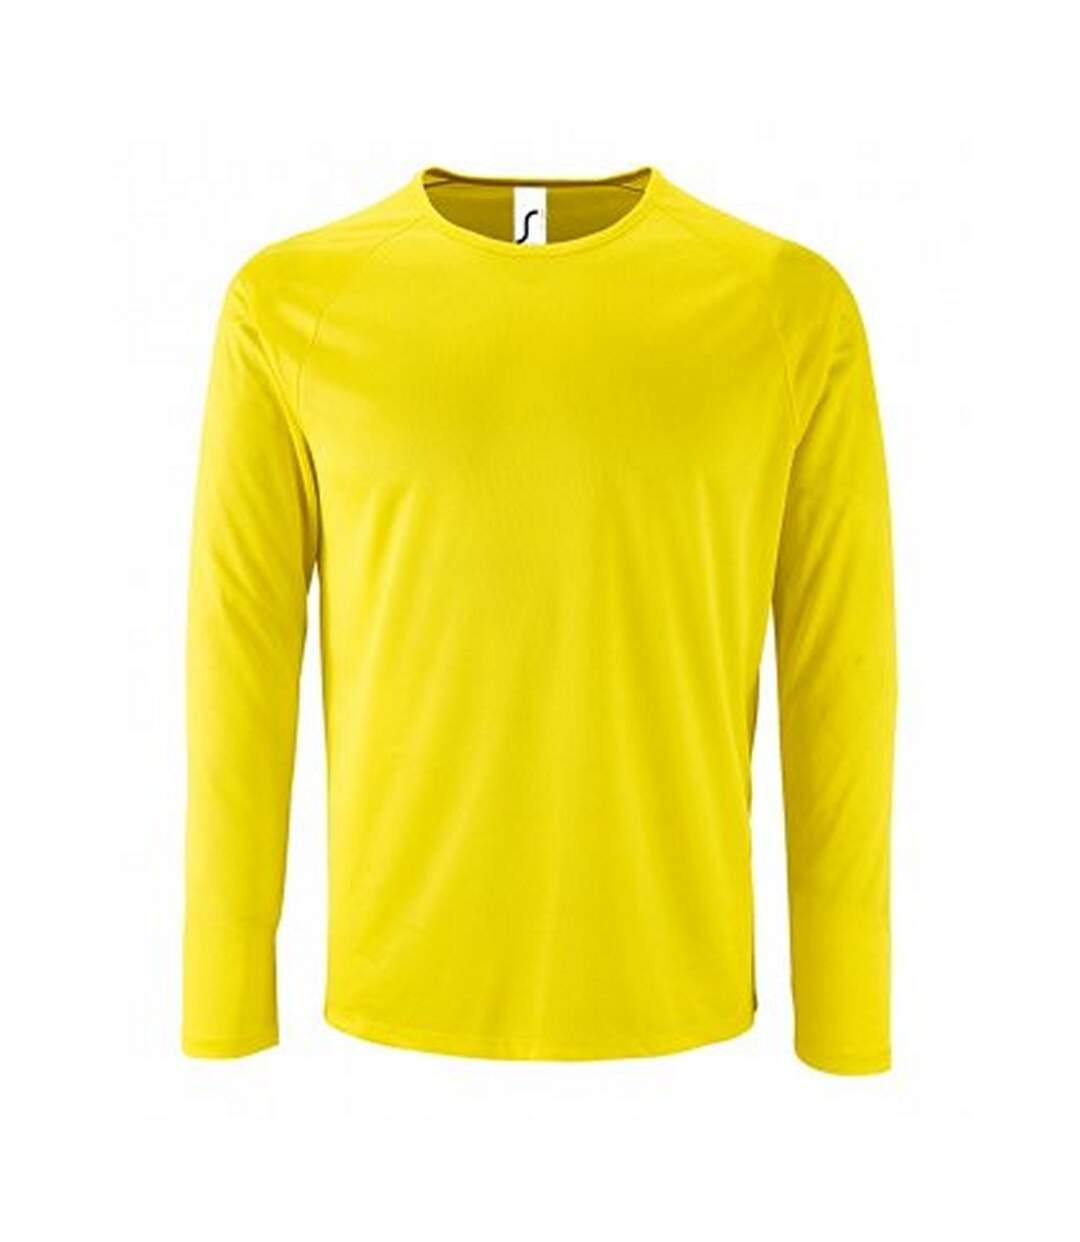 SOLS Mens Sporty Long Sleeve Performance T-Shirt (Neon Yellow) - UTPC2903